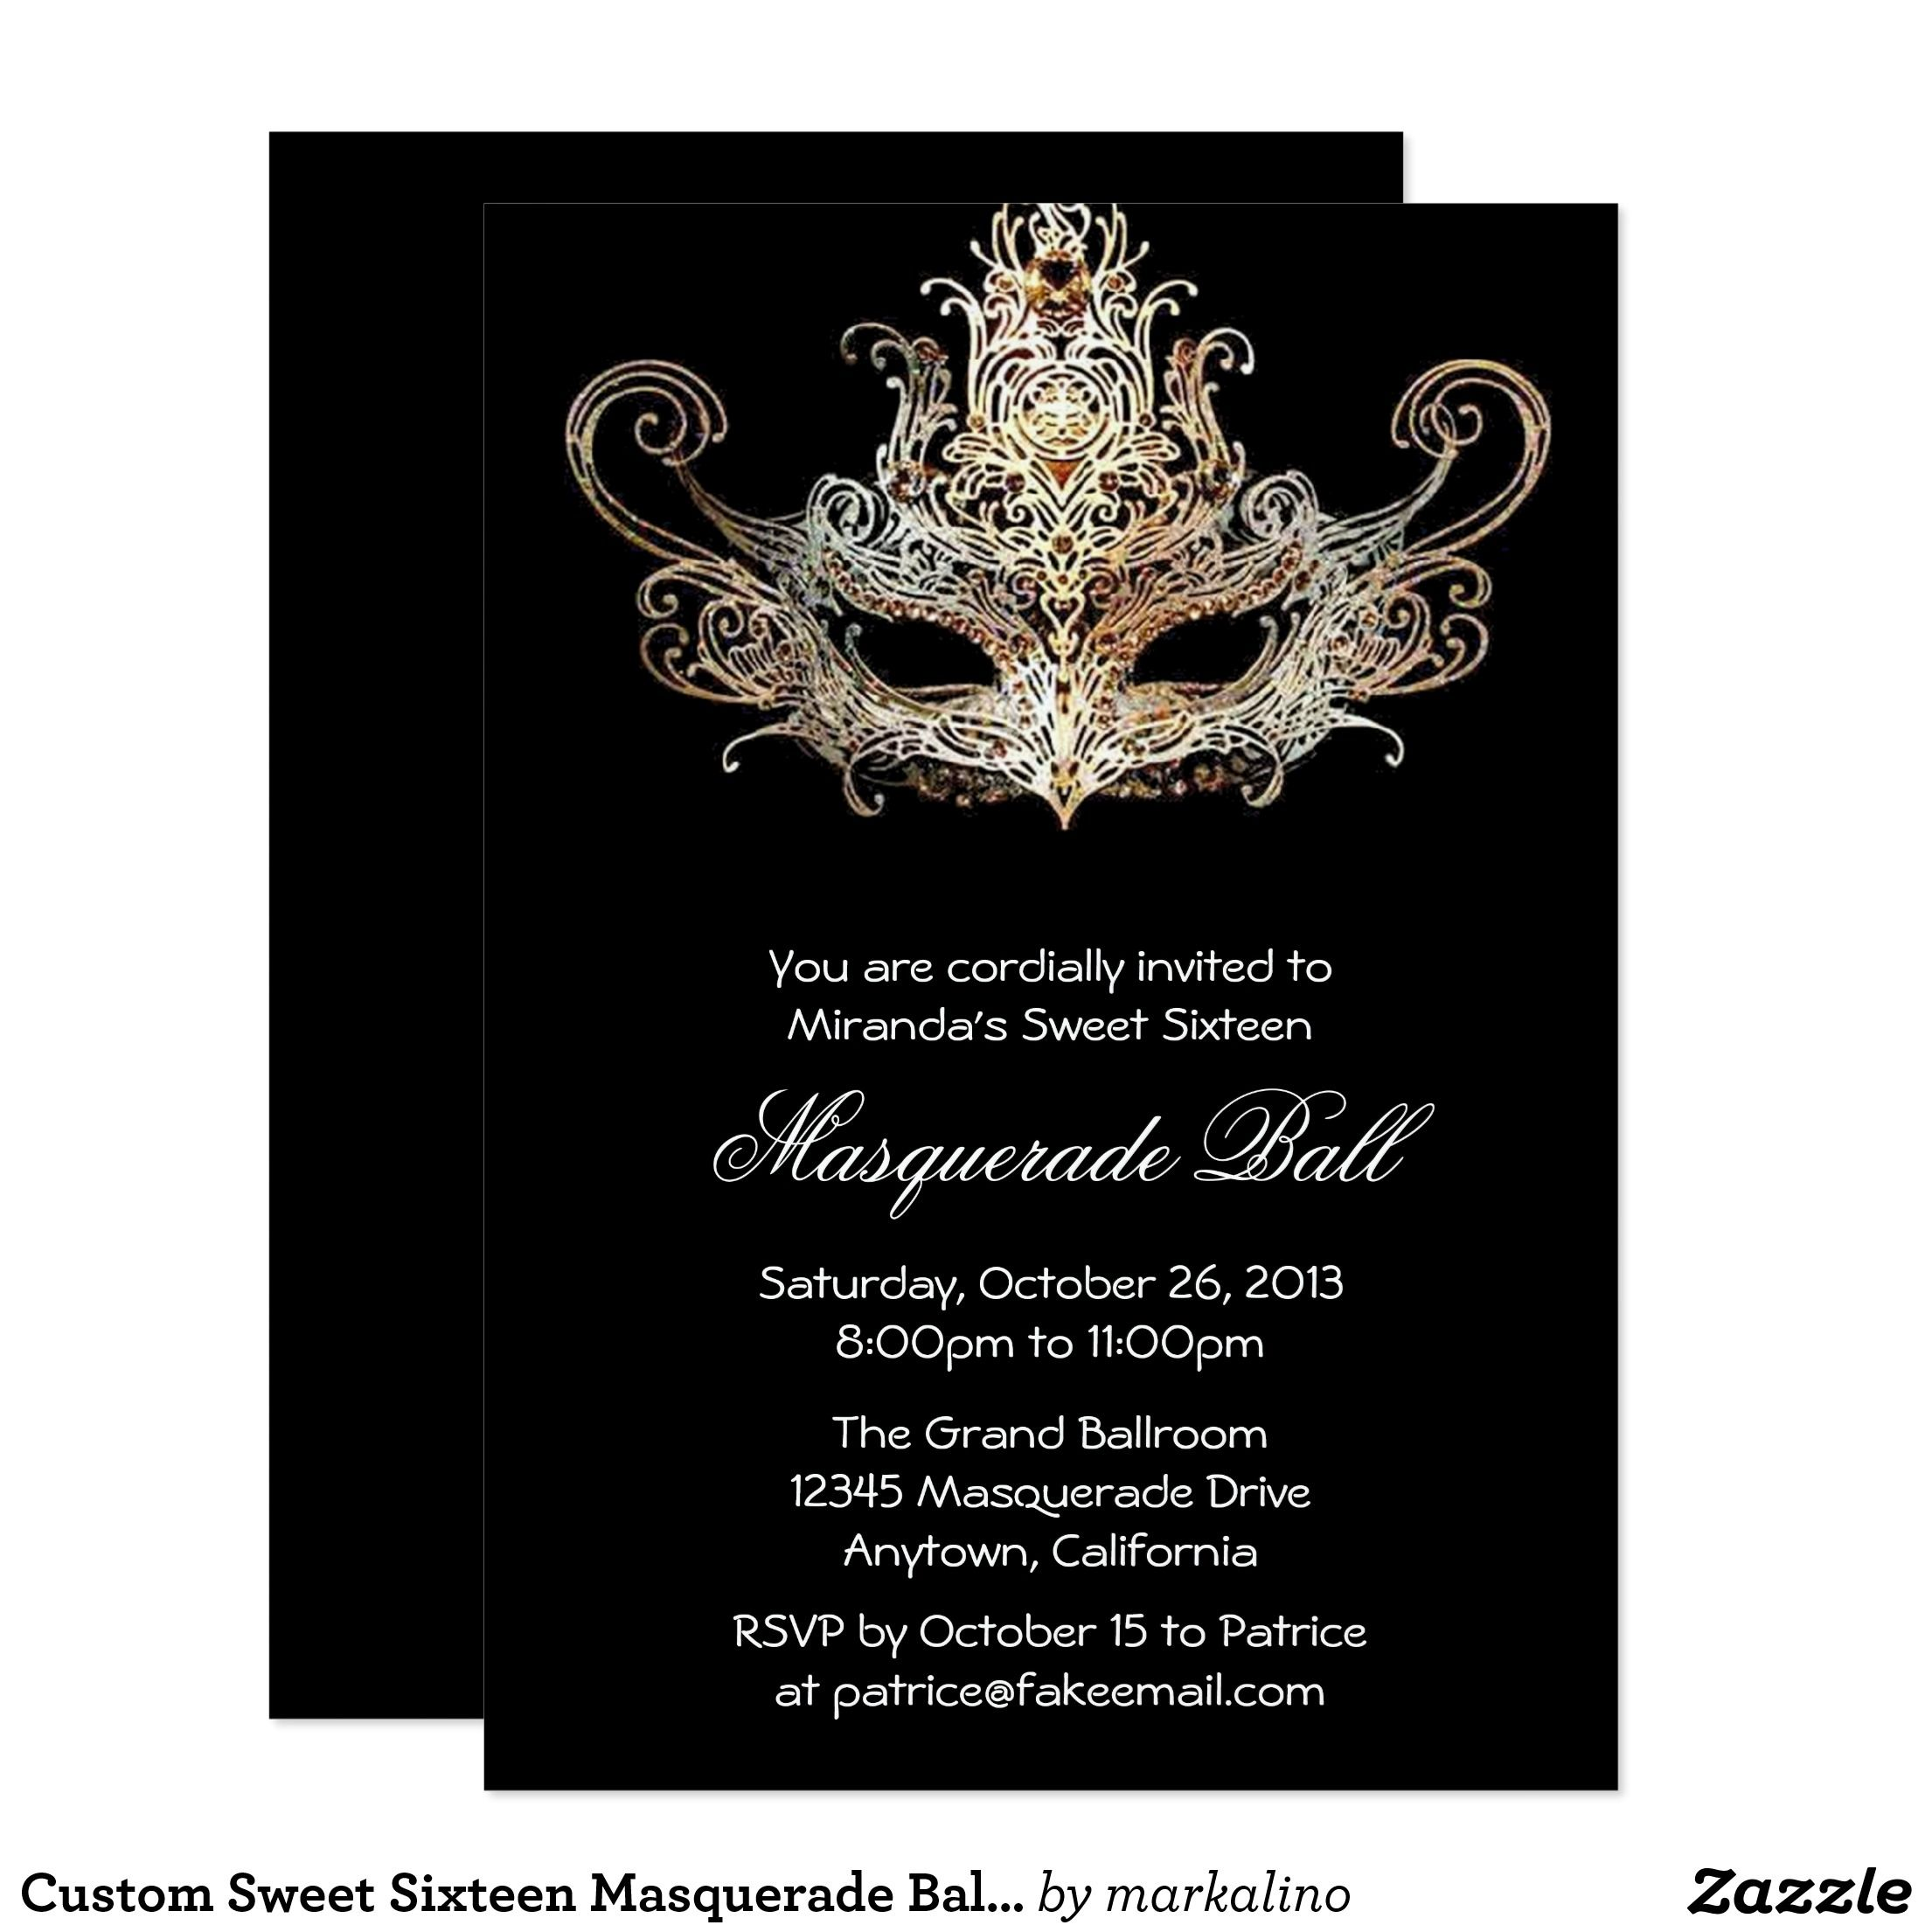 Custom Sweet Six Masquerade Ball Invitations